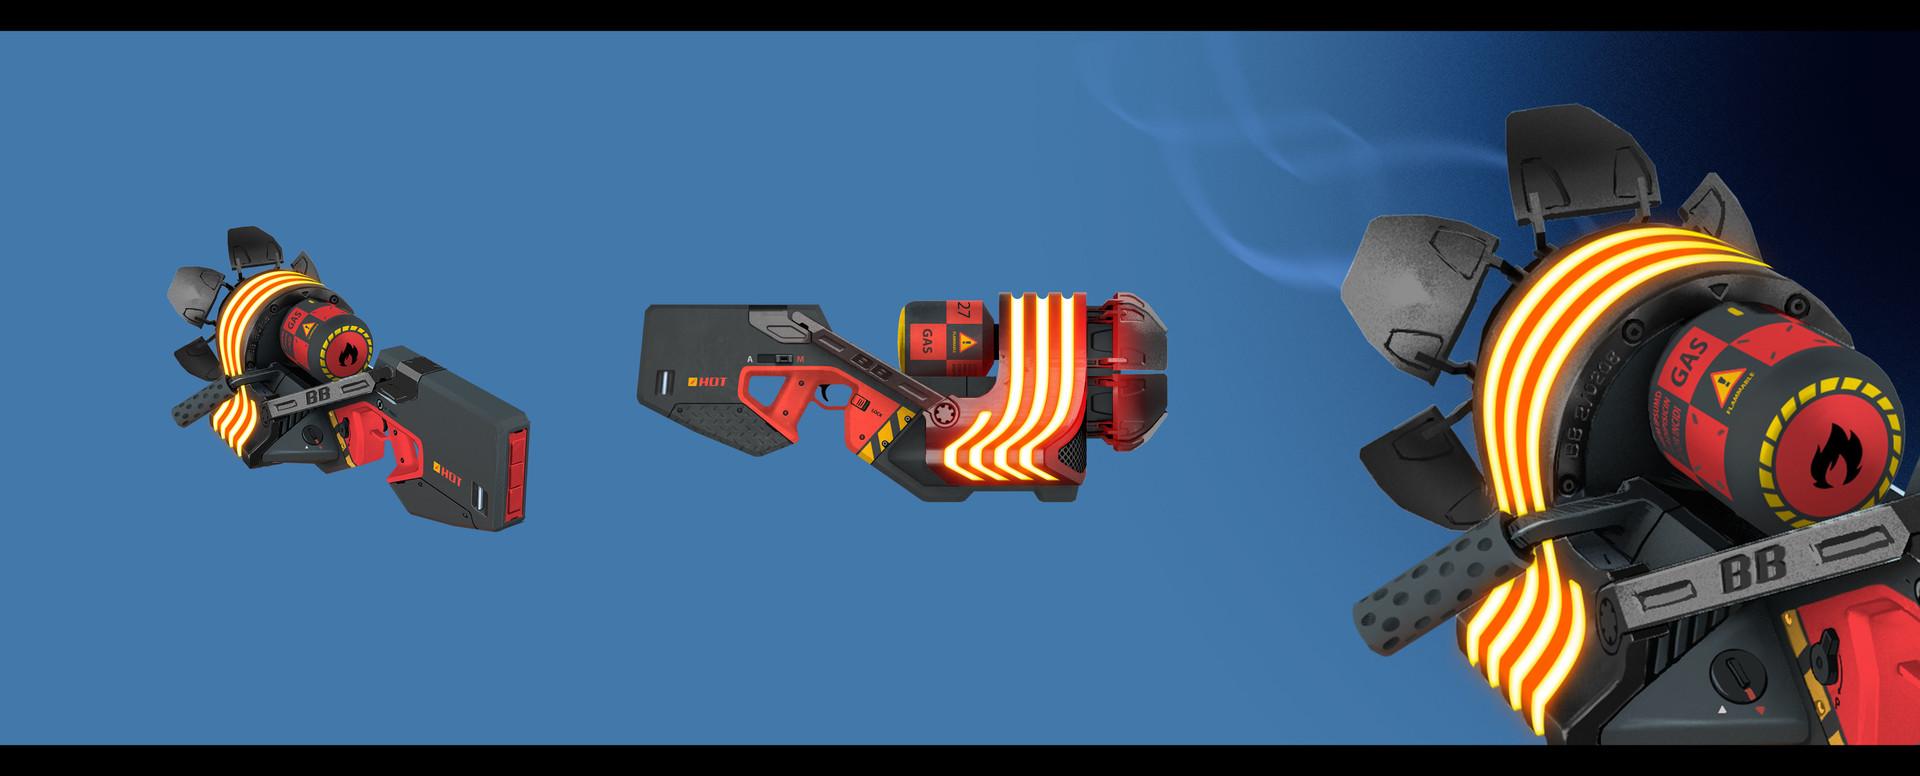 Sergey grunin burning sulfur concept premium